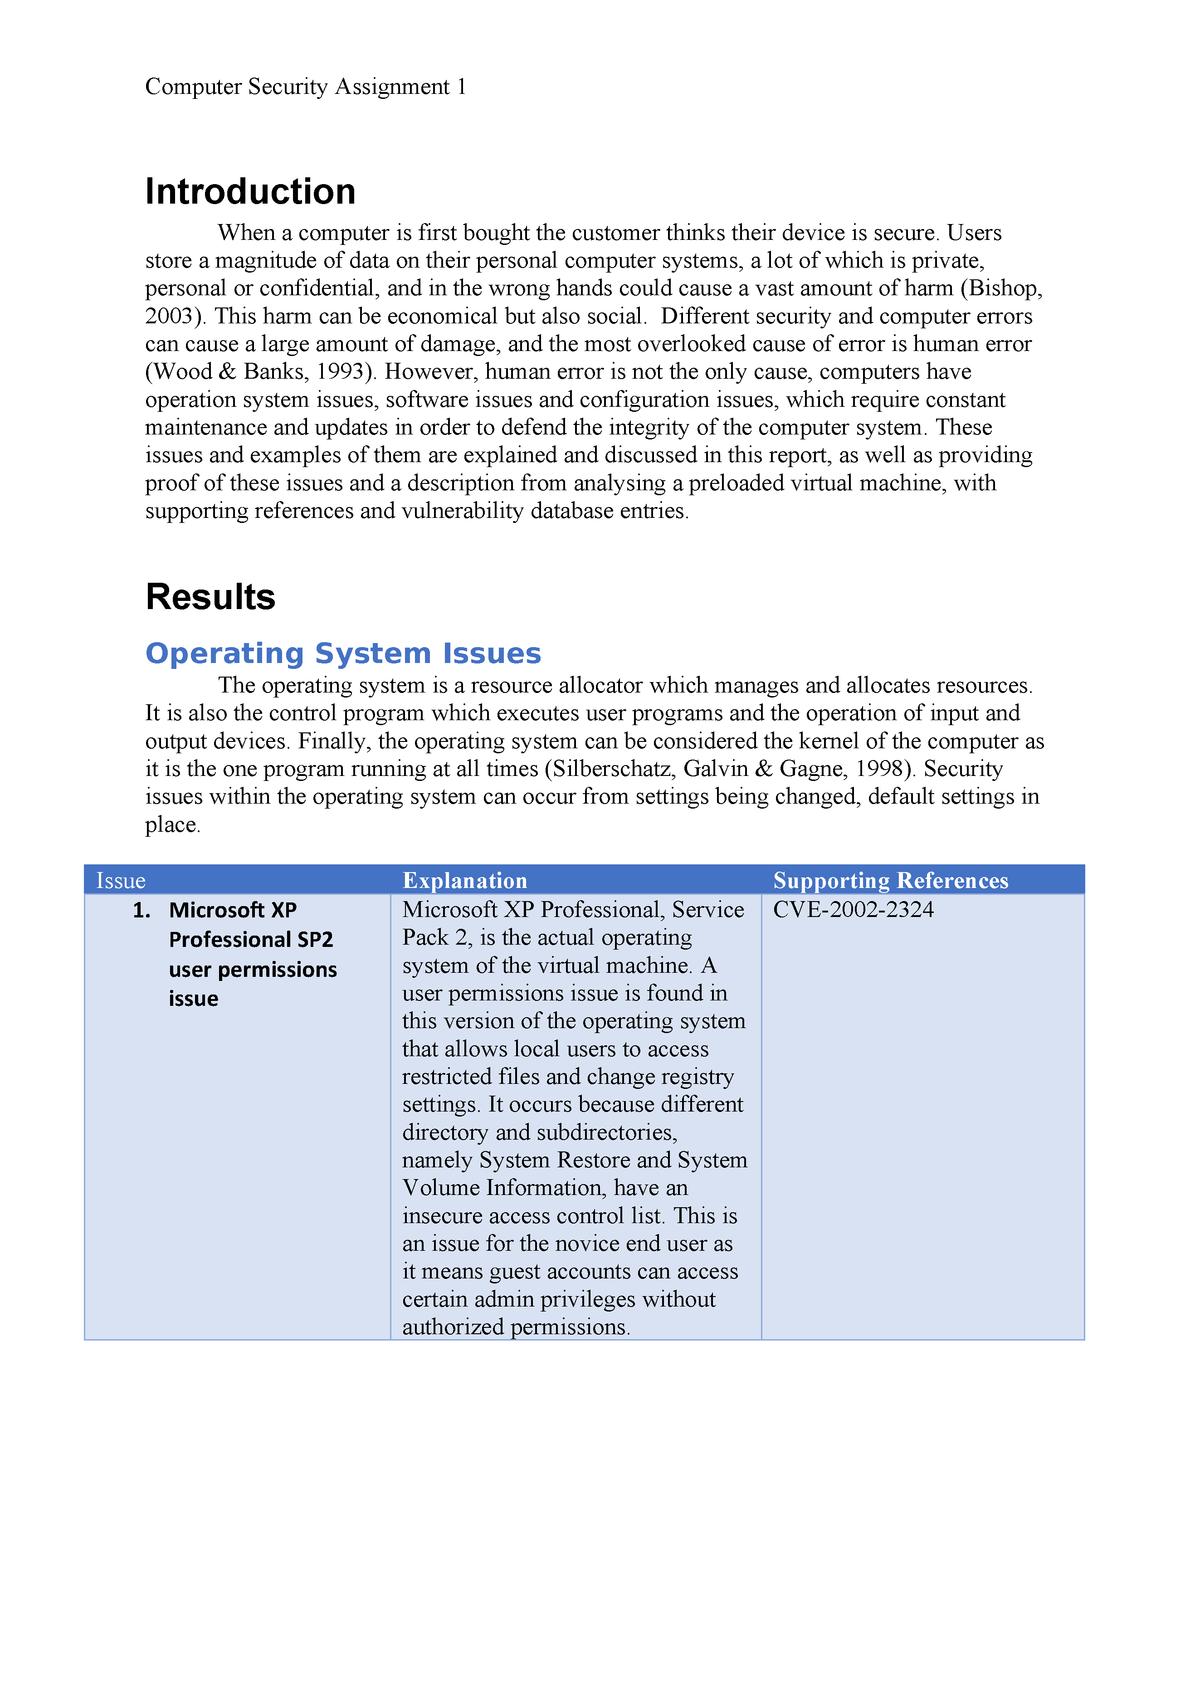 CS Assignment 1 - CSI1101 Computer Security - ECU - StuDocu